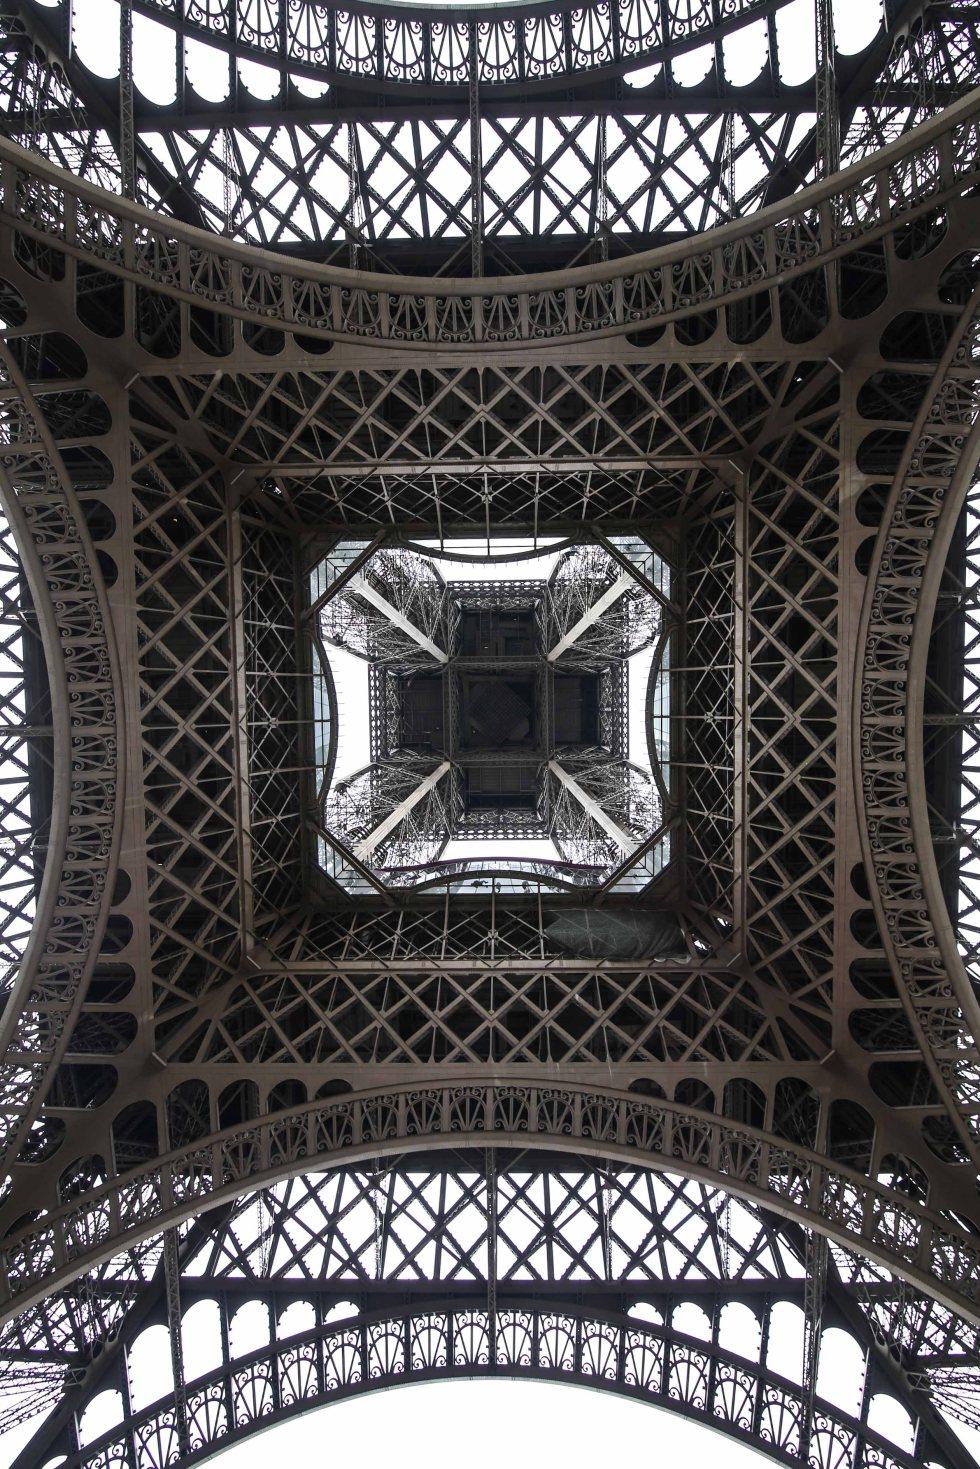 Eiffeltornet-Eiffel tower